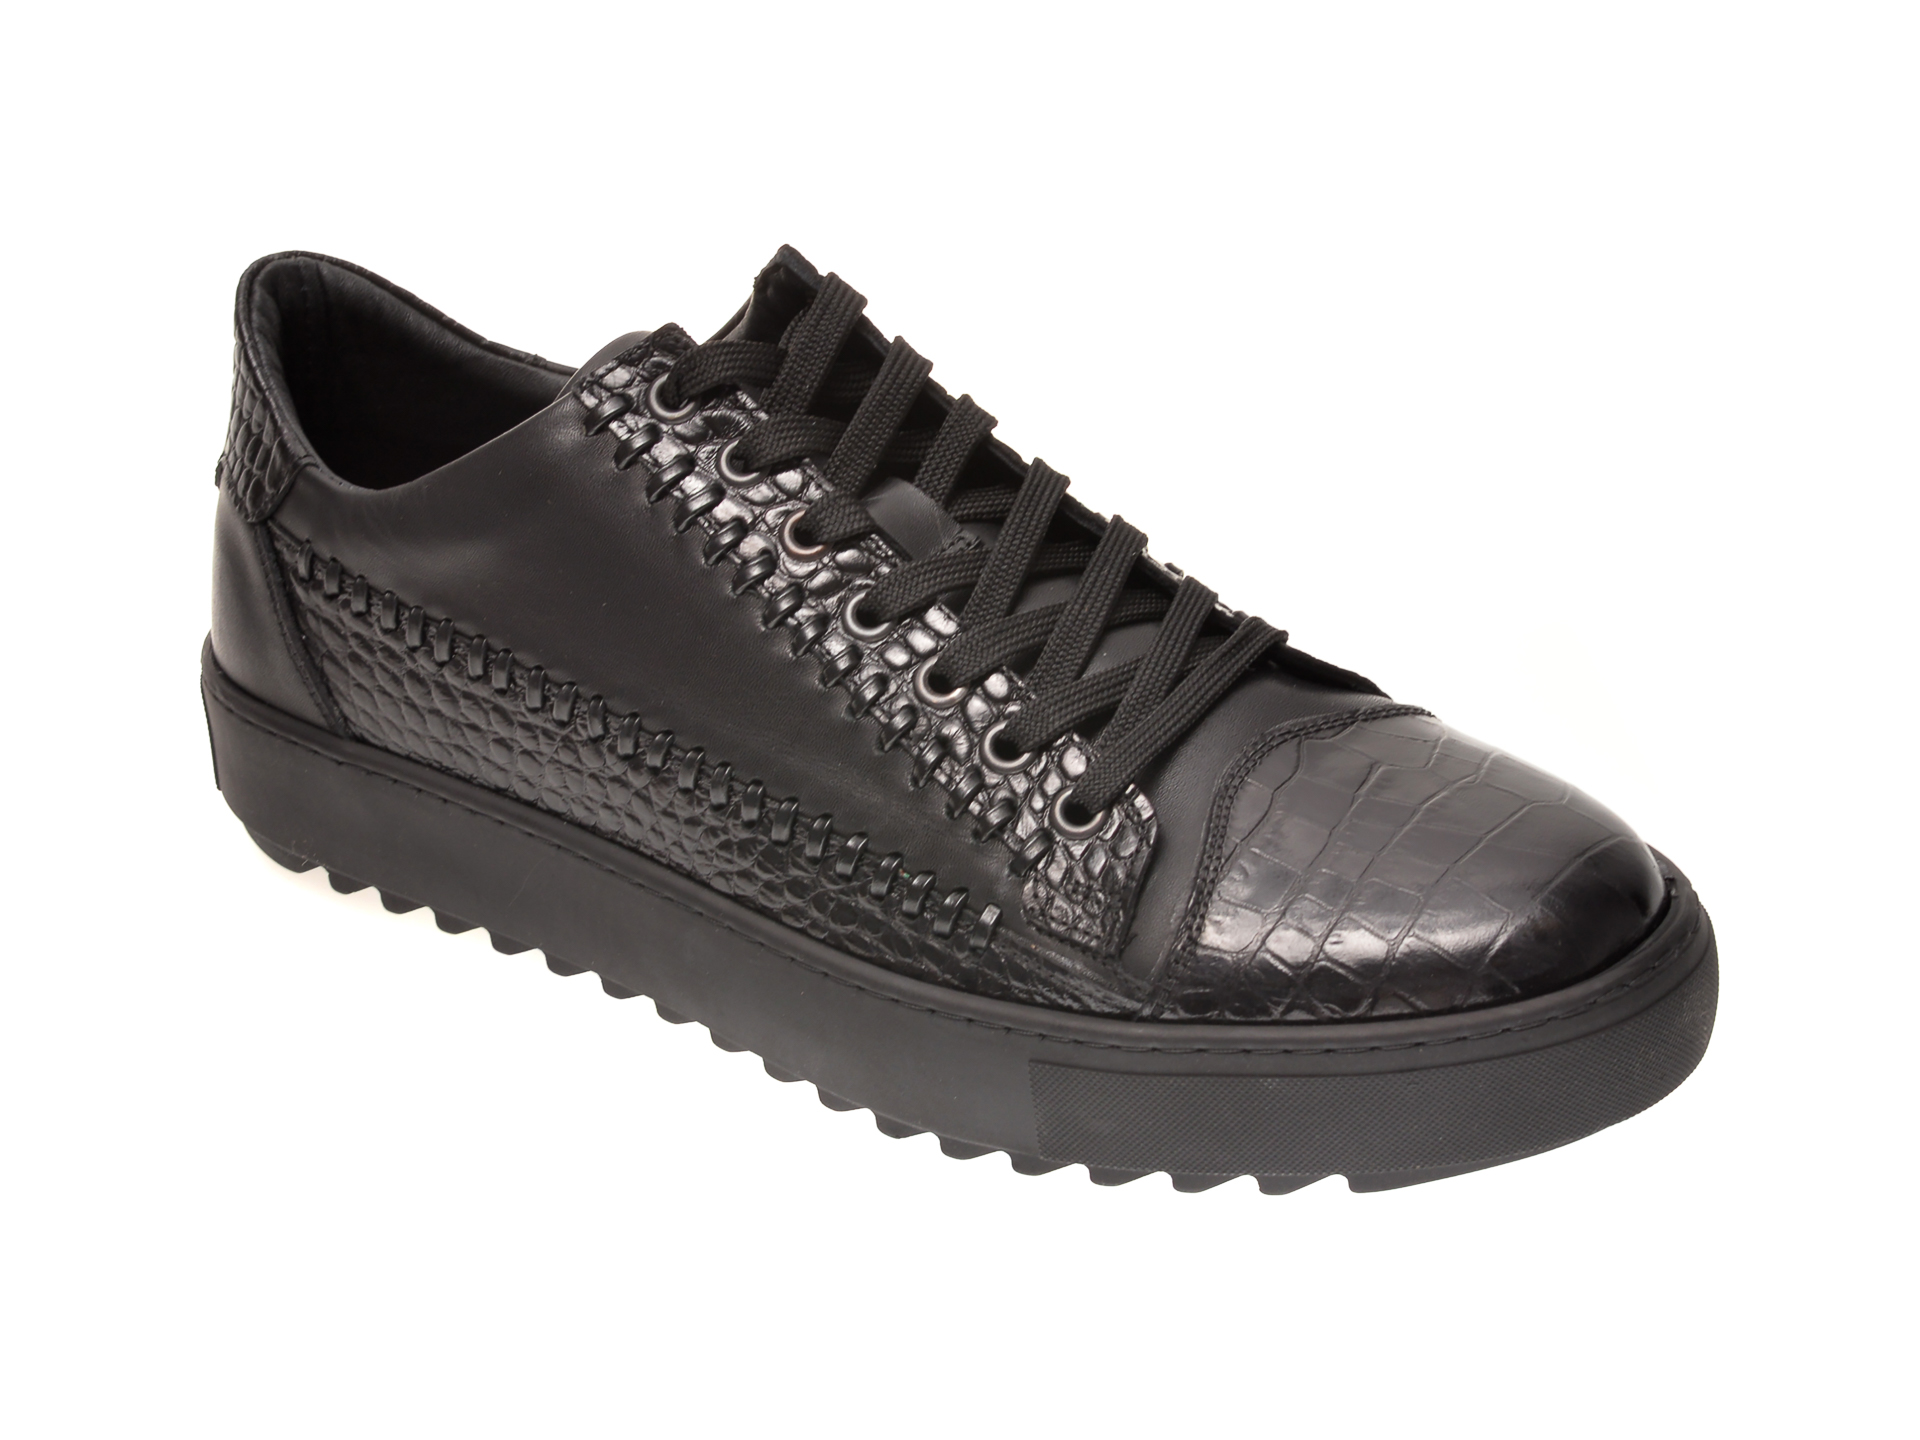 Pantofi Otter Negri, 601, Din Piele Naturala